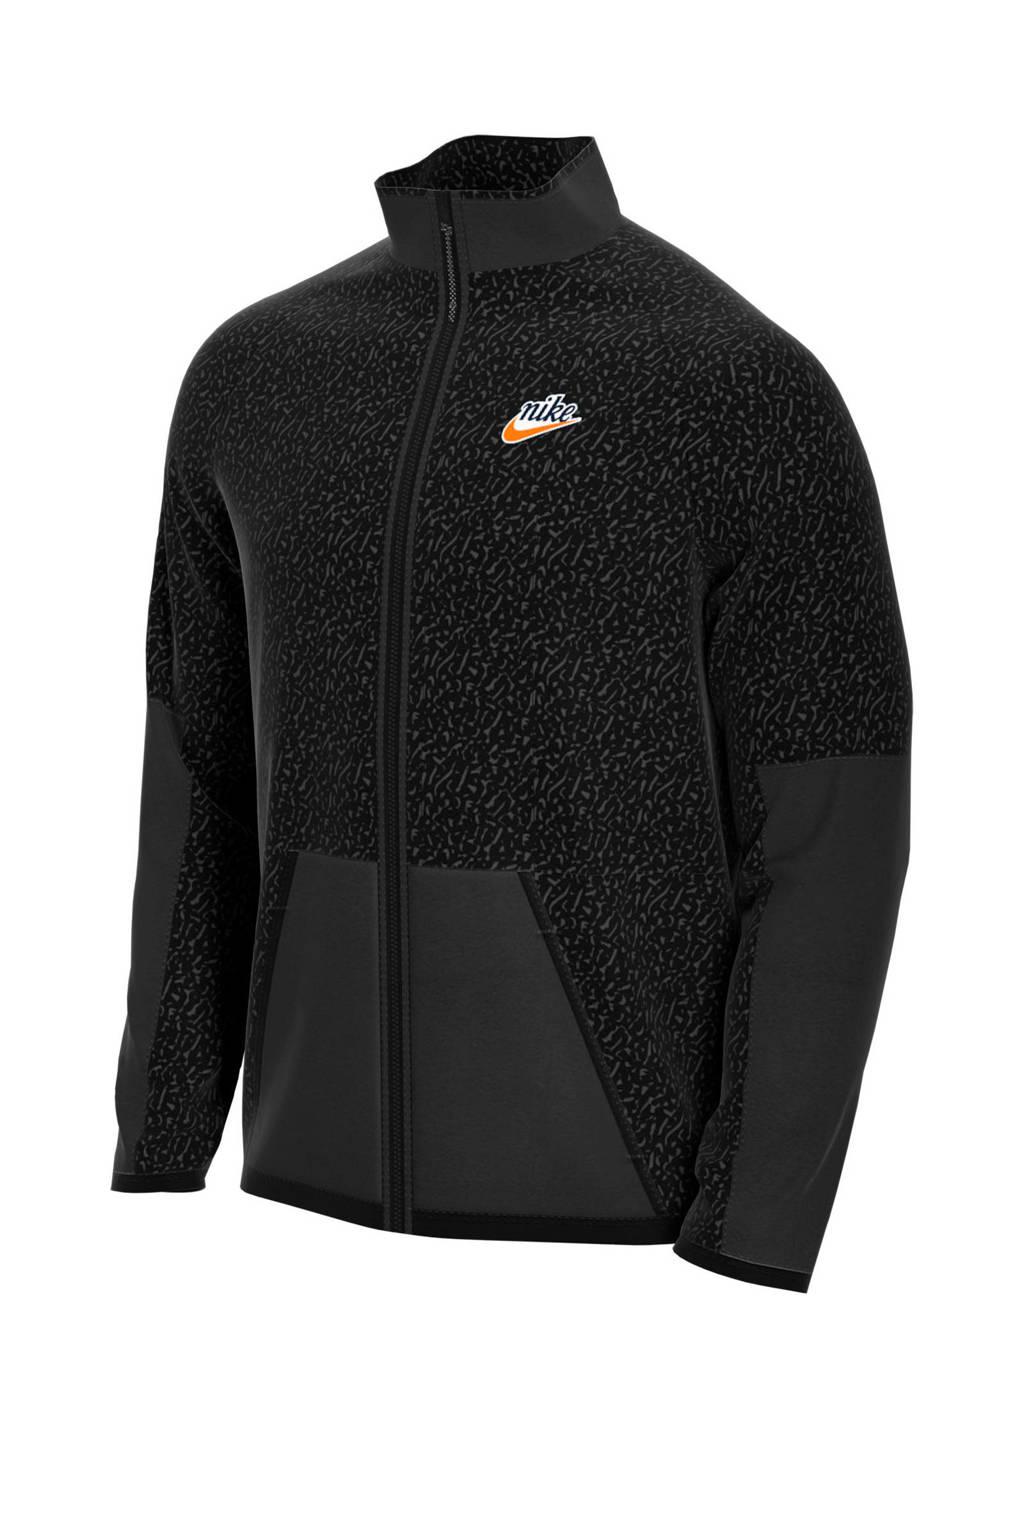 Nike   teddy vest zwart, Zwart